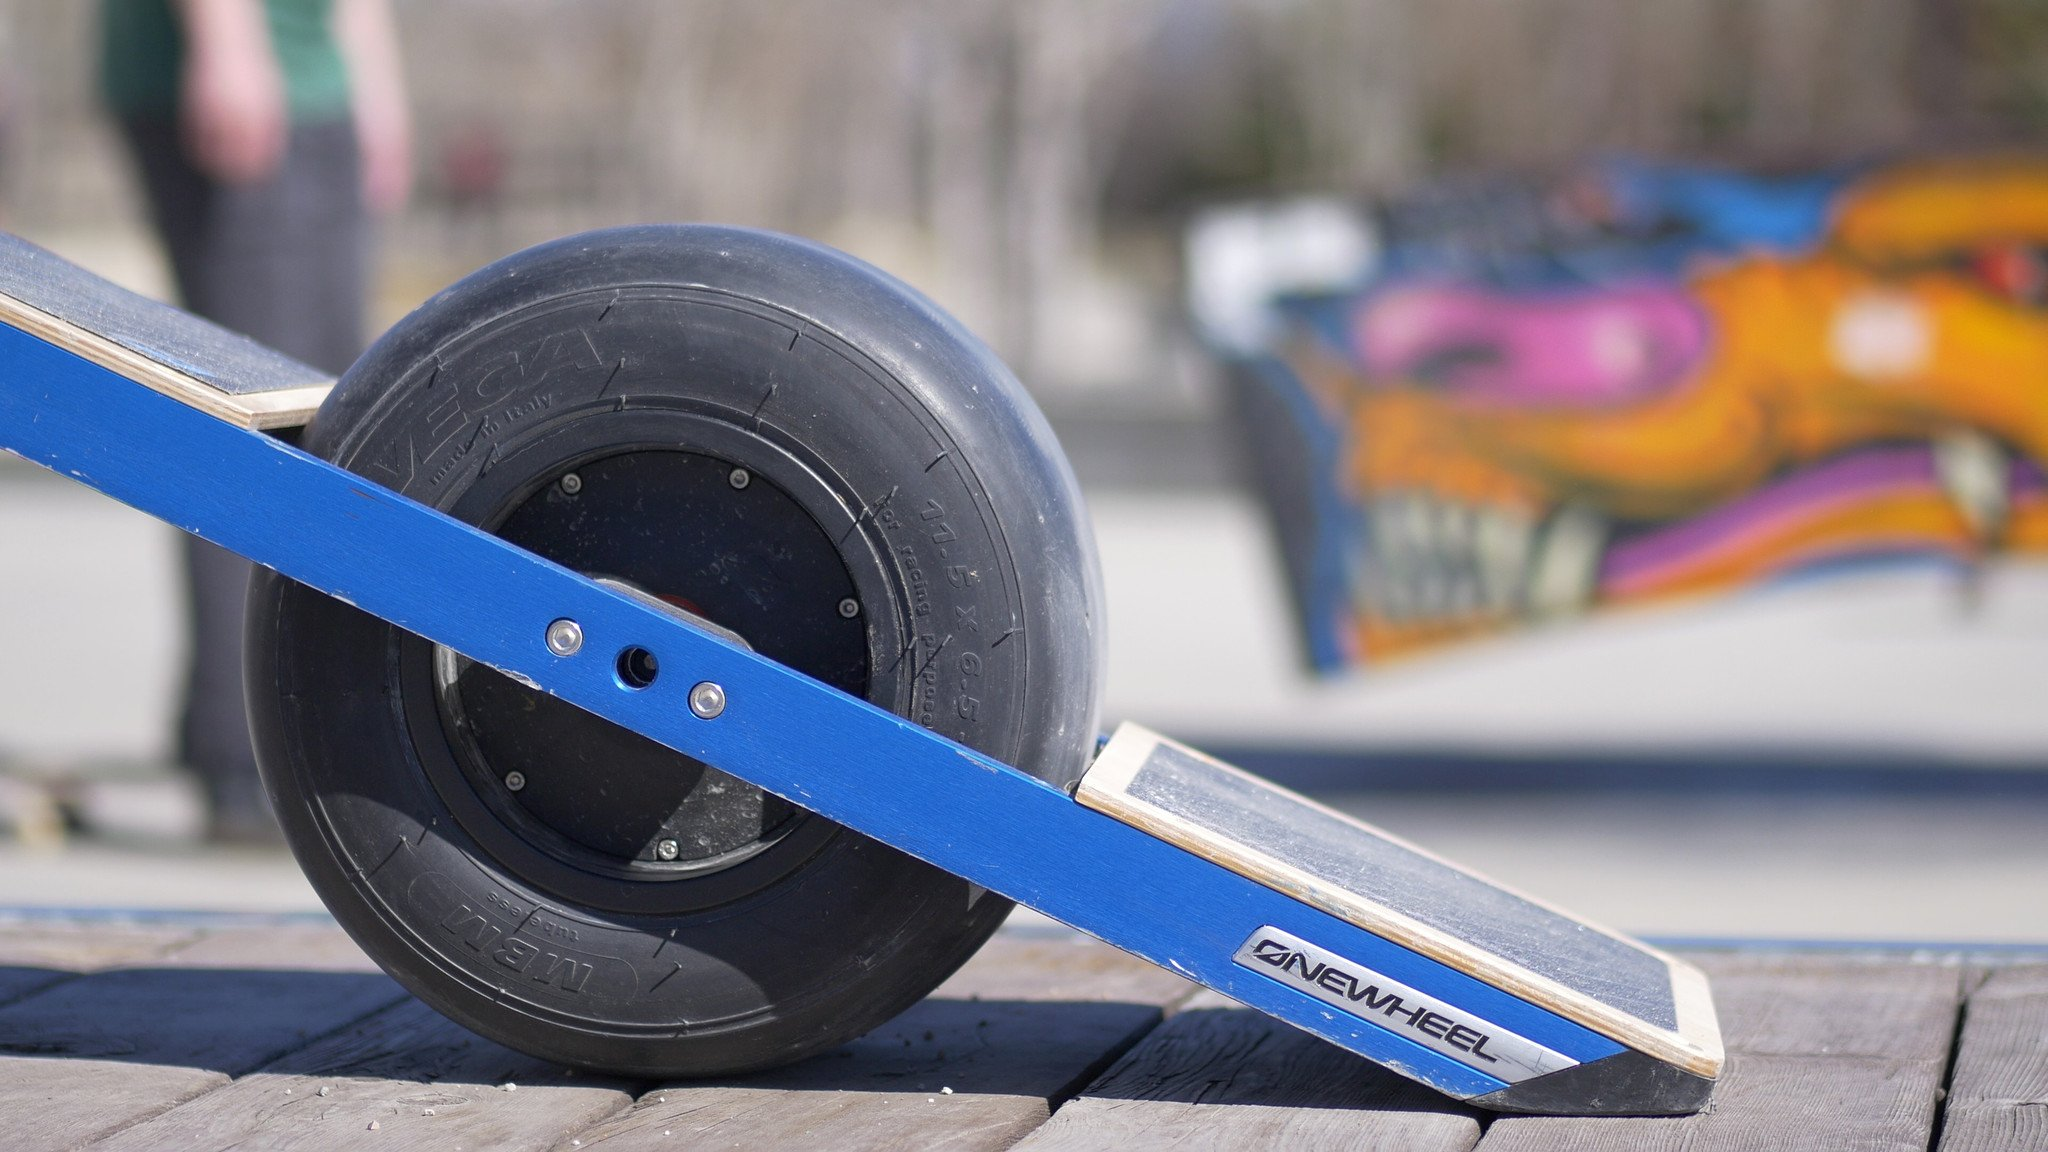 Best Car Lock Screen Wallpaper The Magical Onewheel Electric Skateboard Now Has An